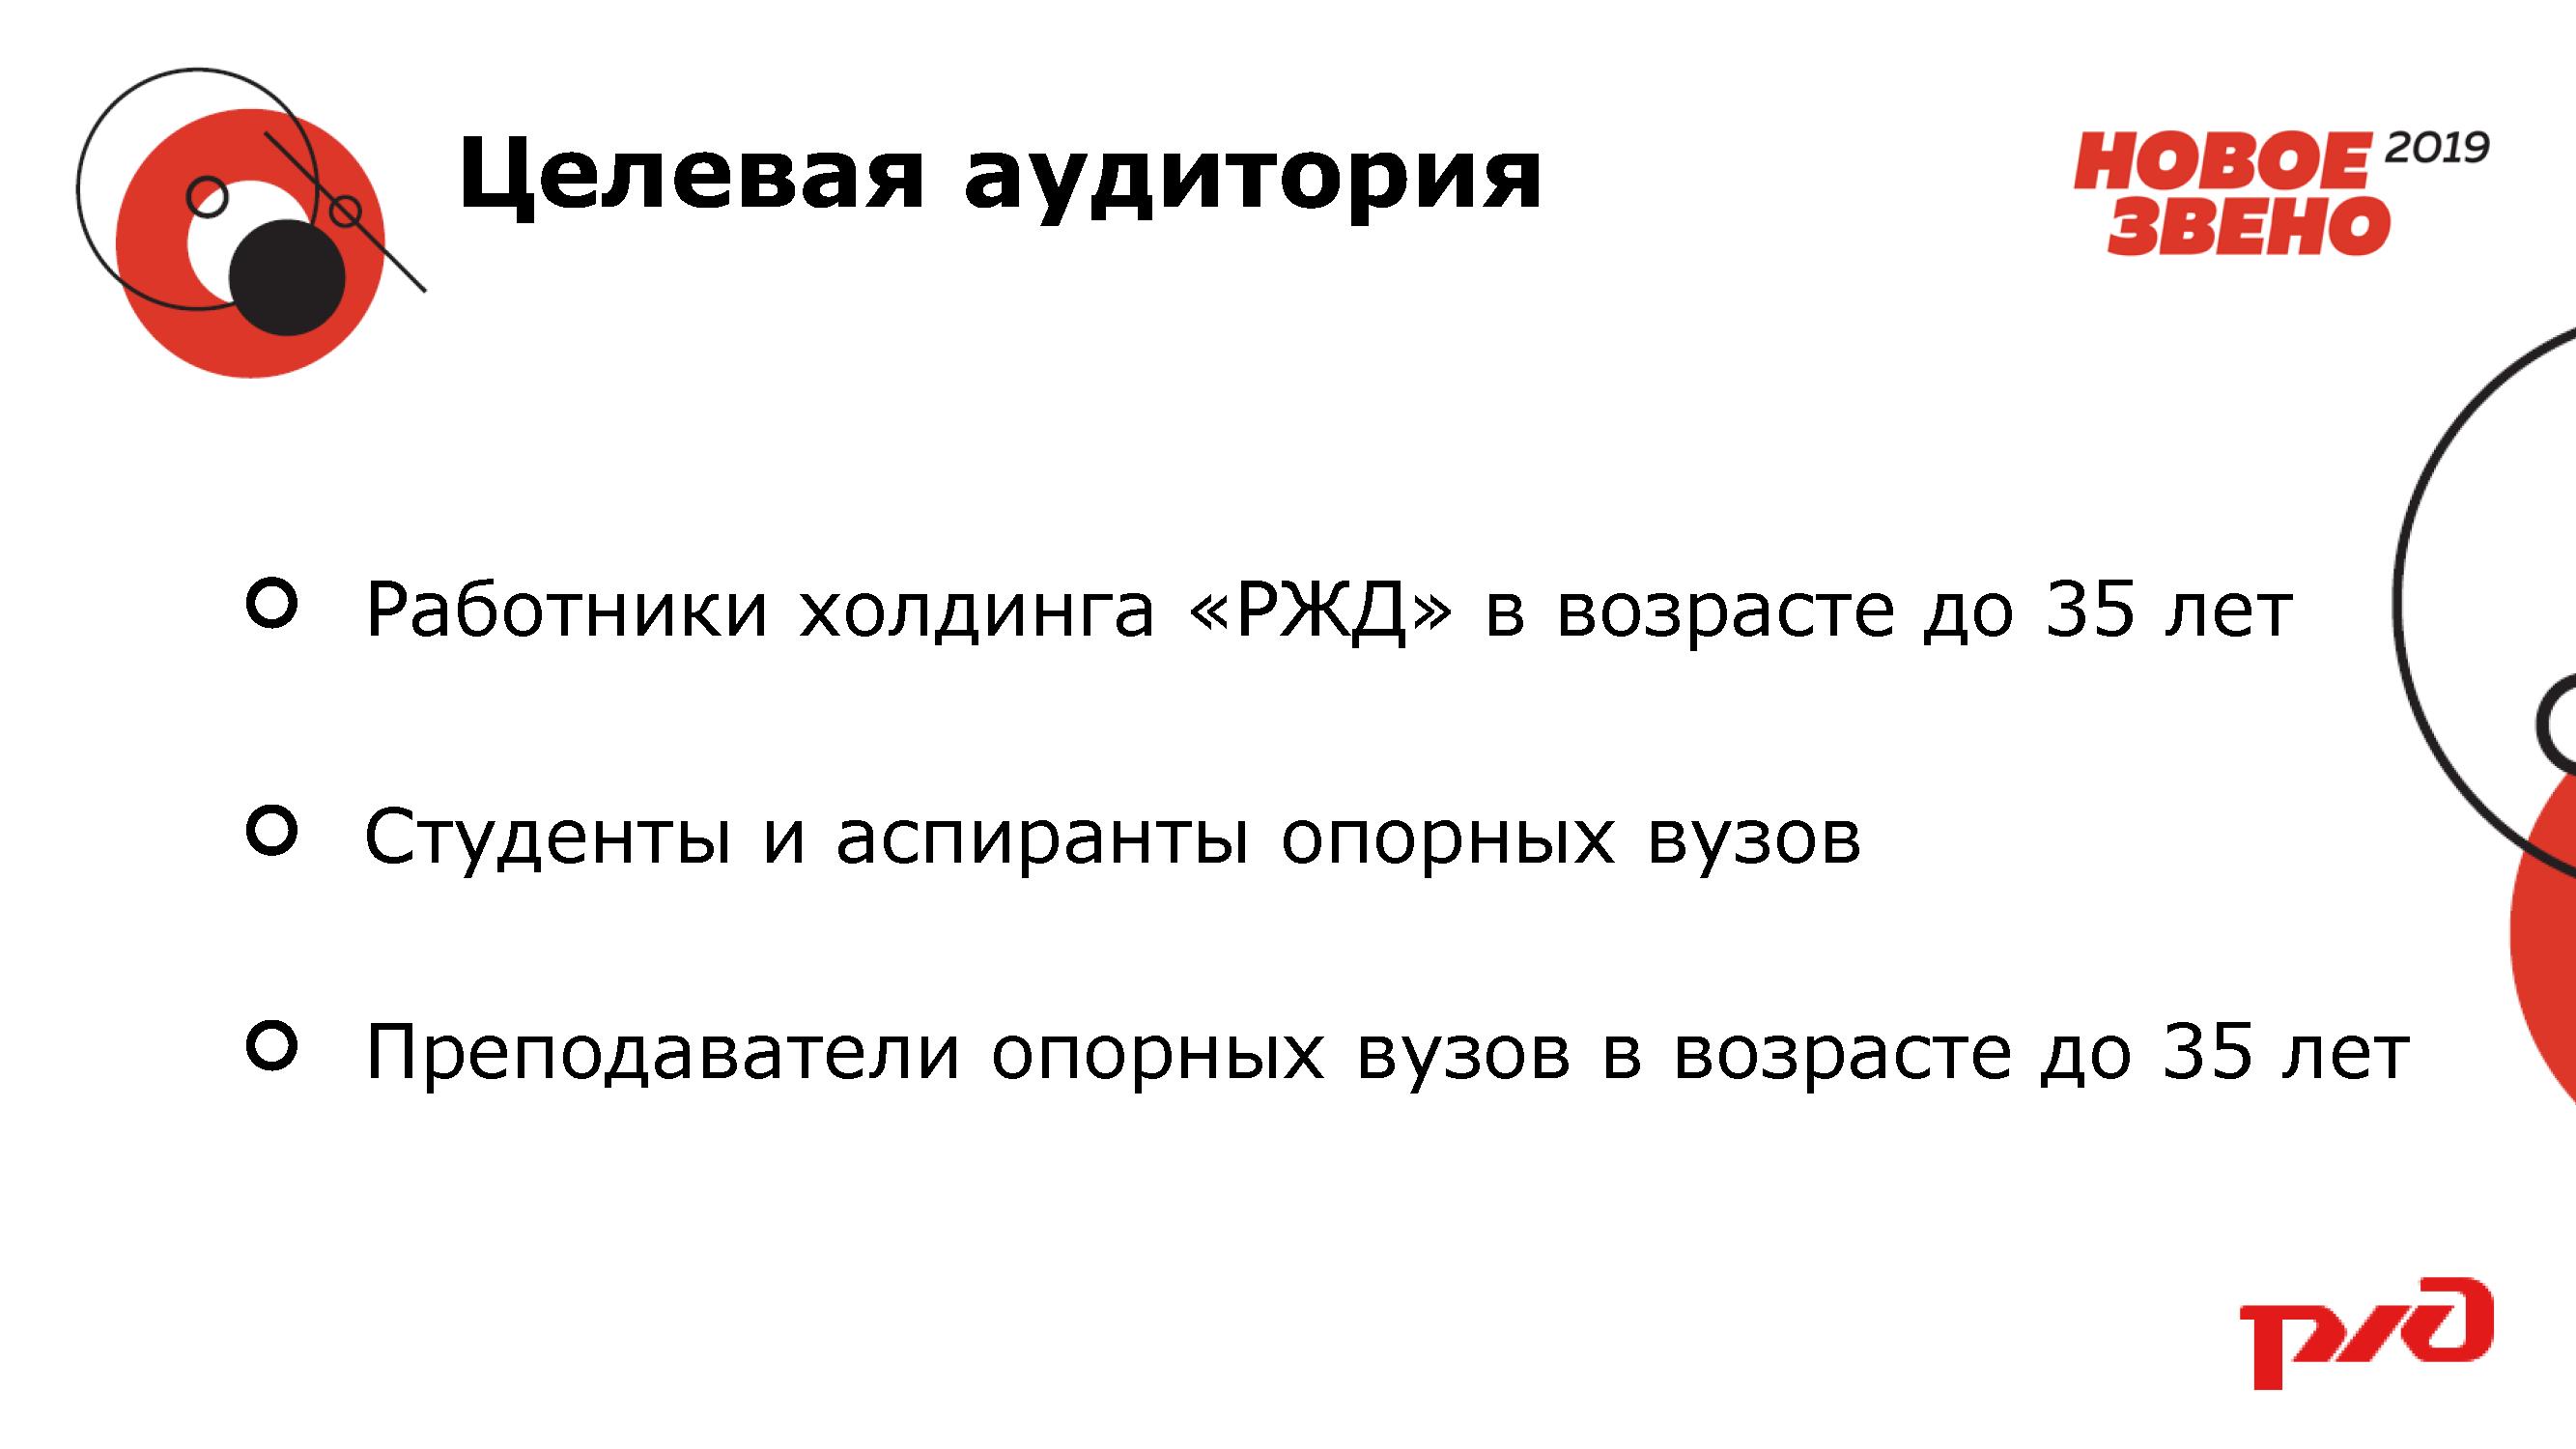 Общая презентация_Новое звено ИТОГ_Страница_3